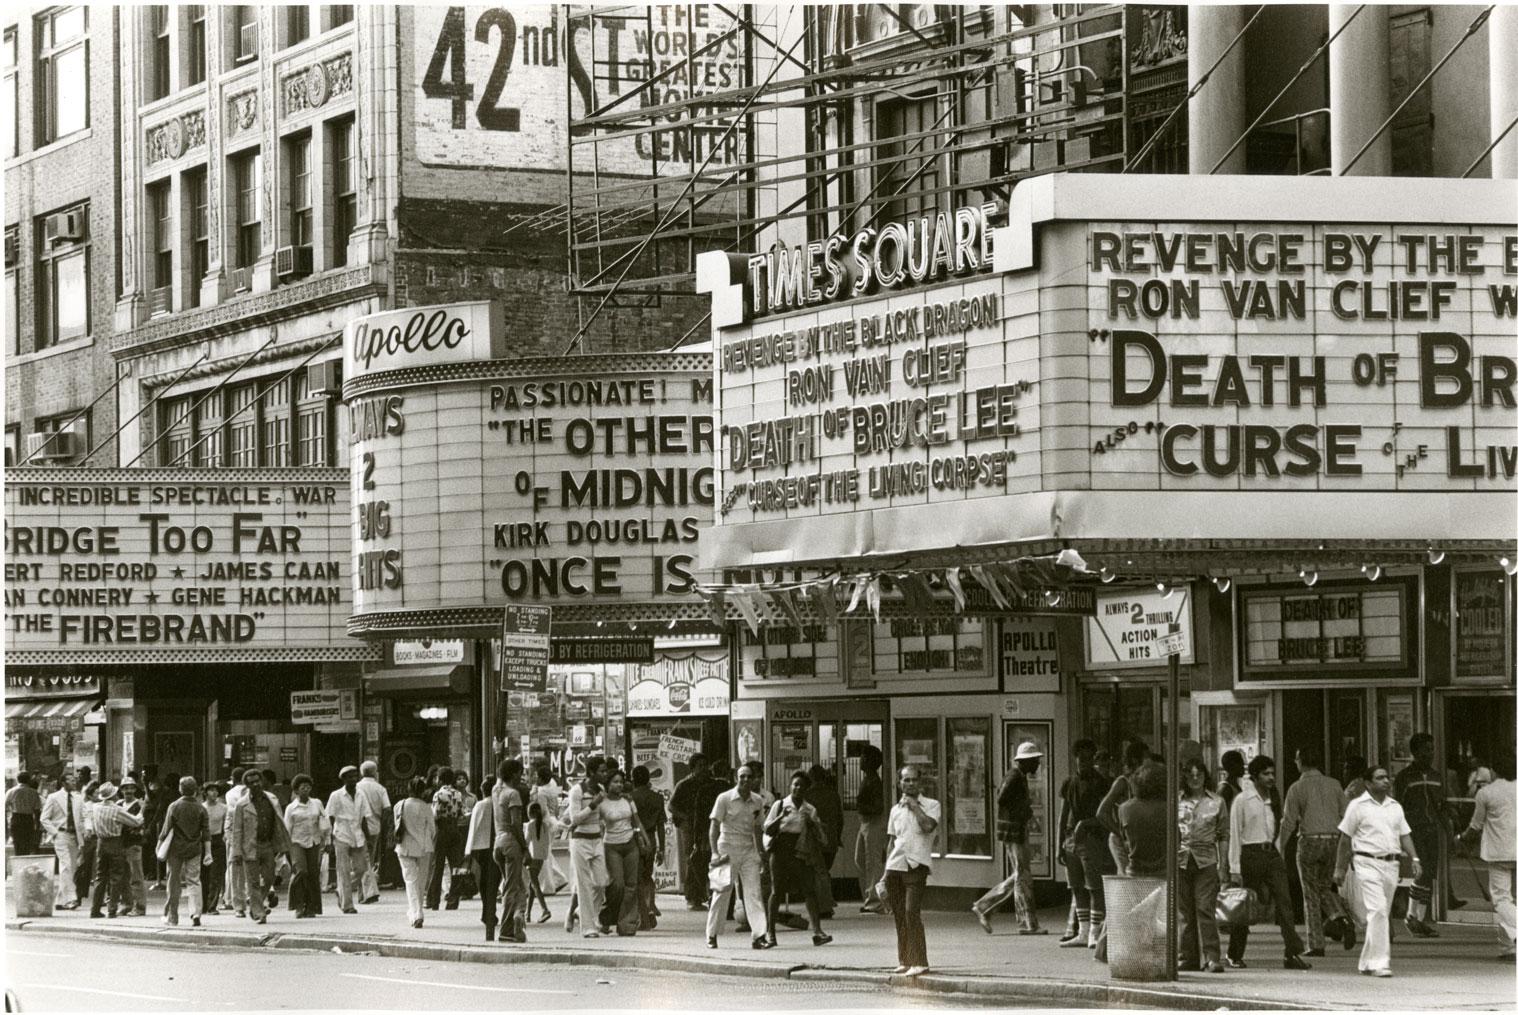 The Apollo and Times Square Theatres, circa 1977. Credit: New York Historical Society